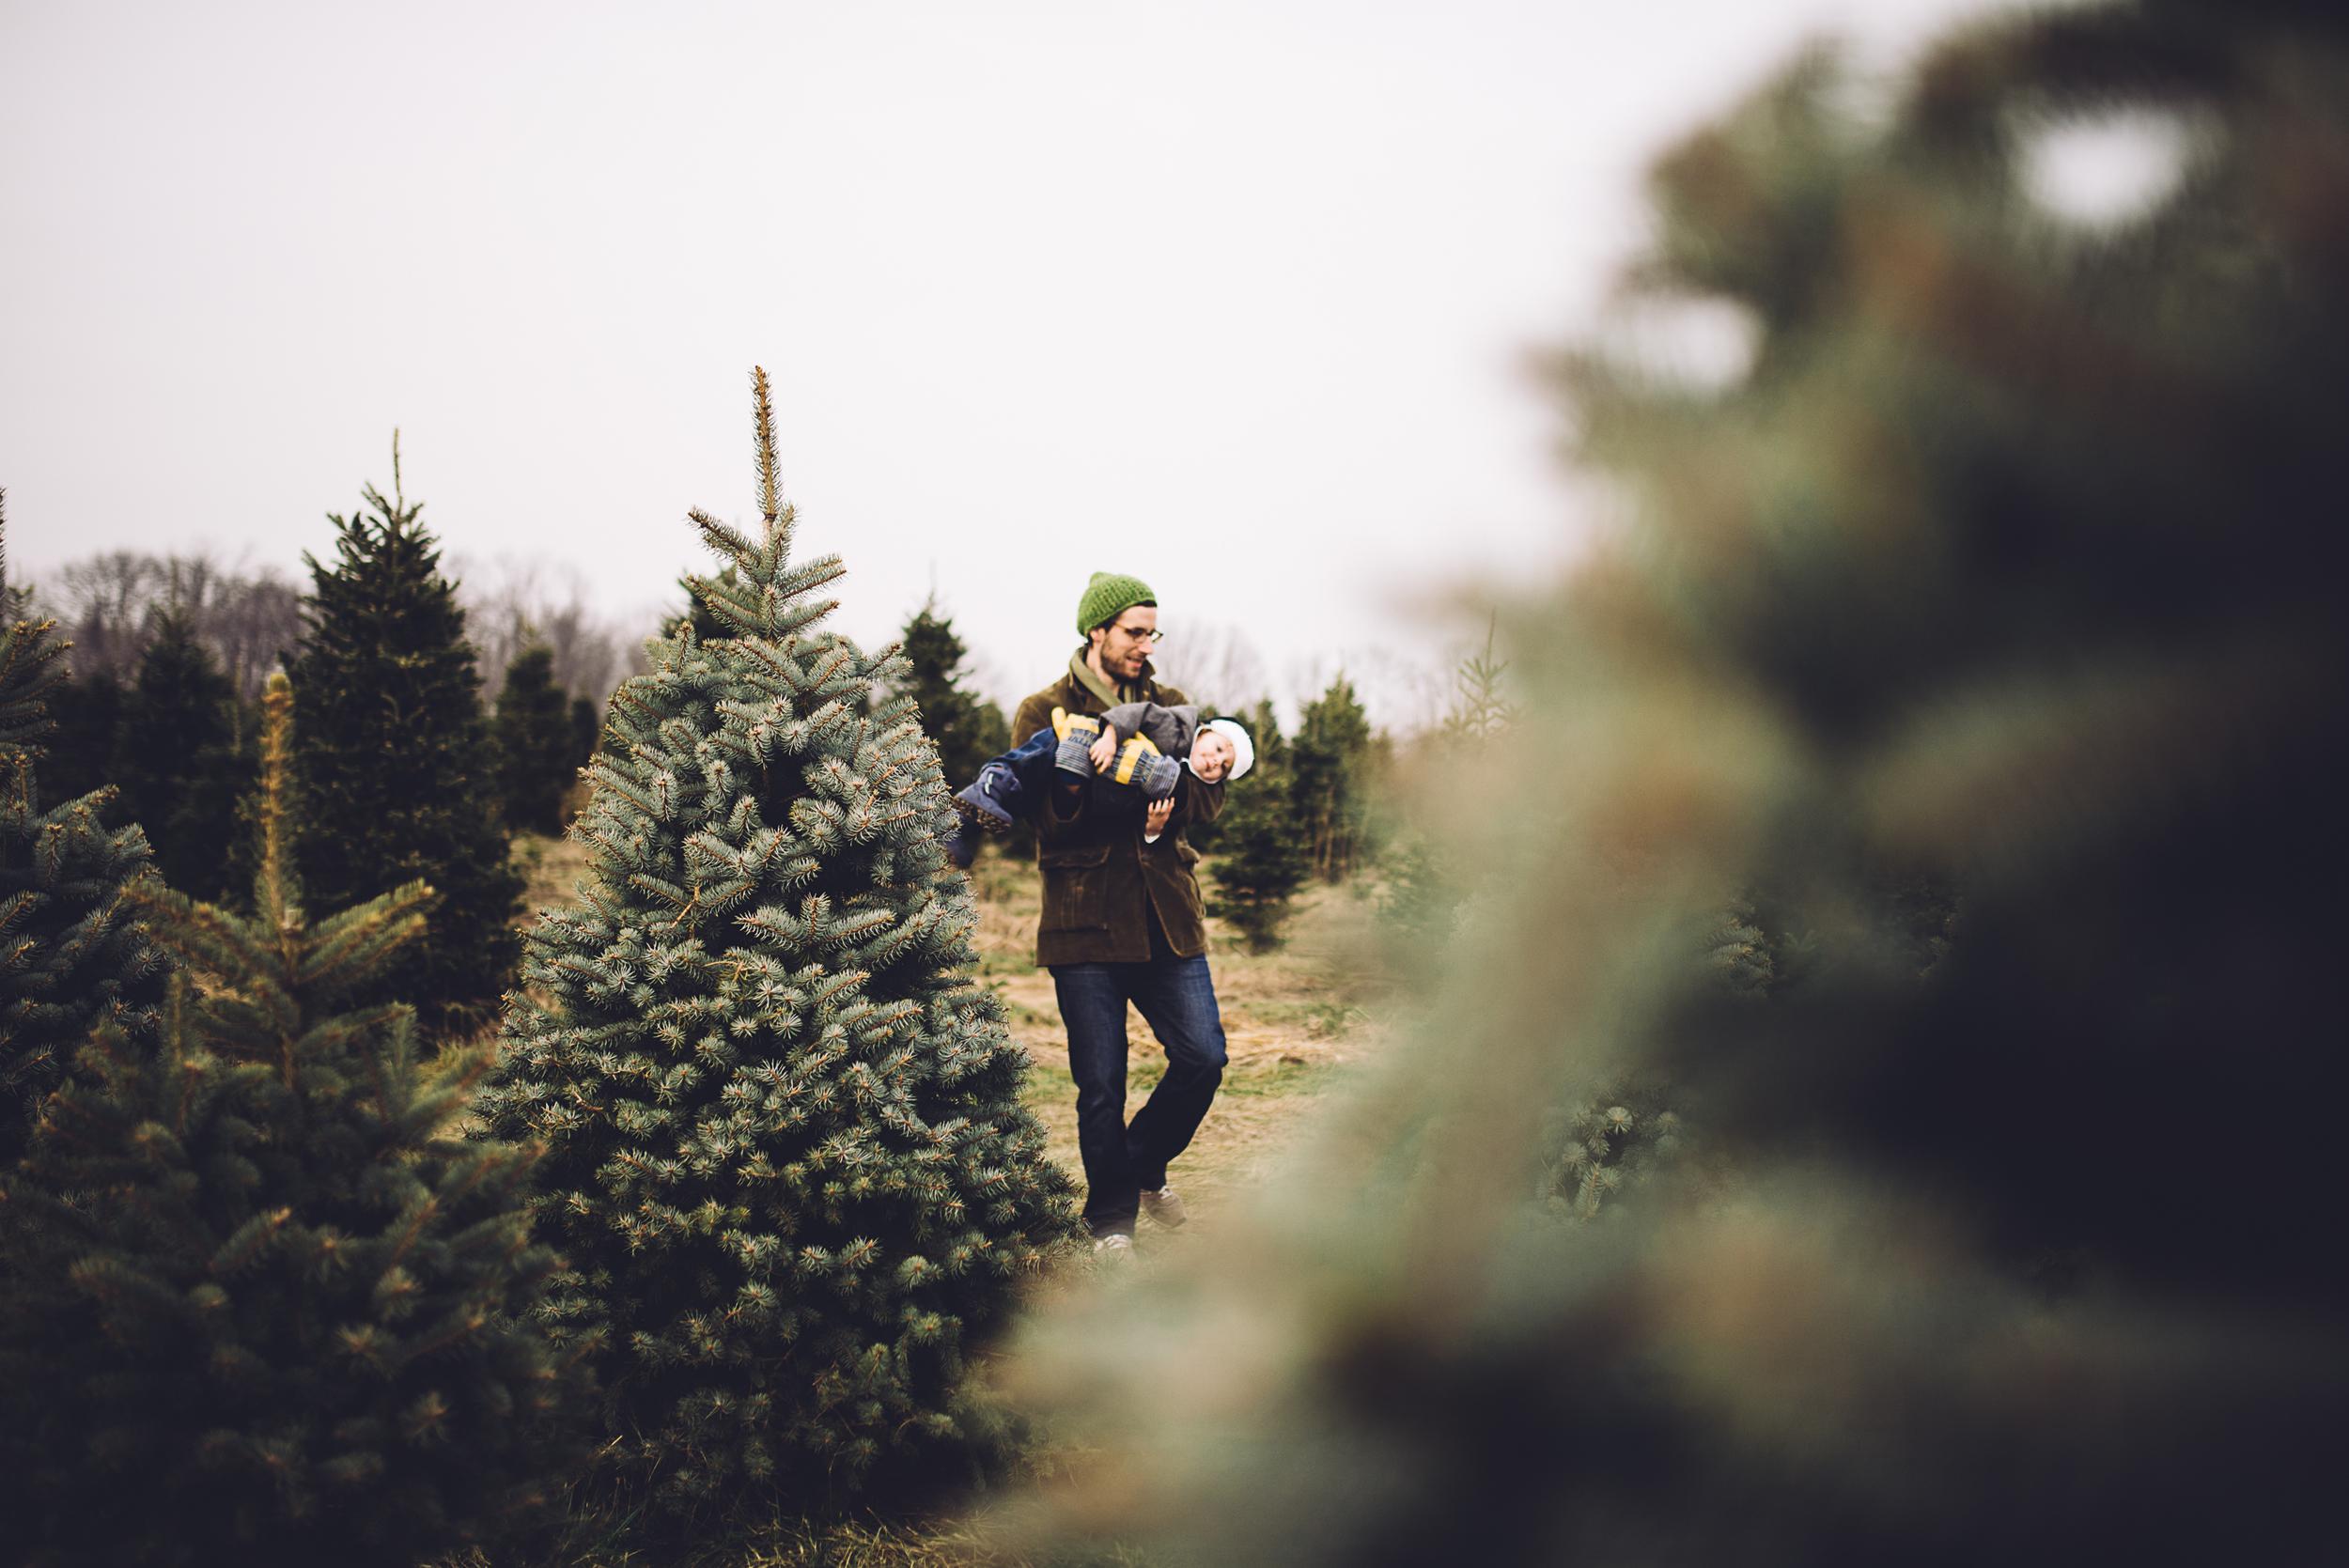 christmas-tree-cutting-6.jpg